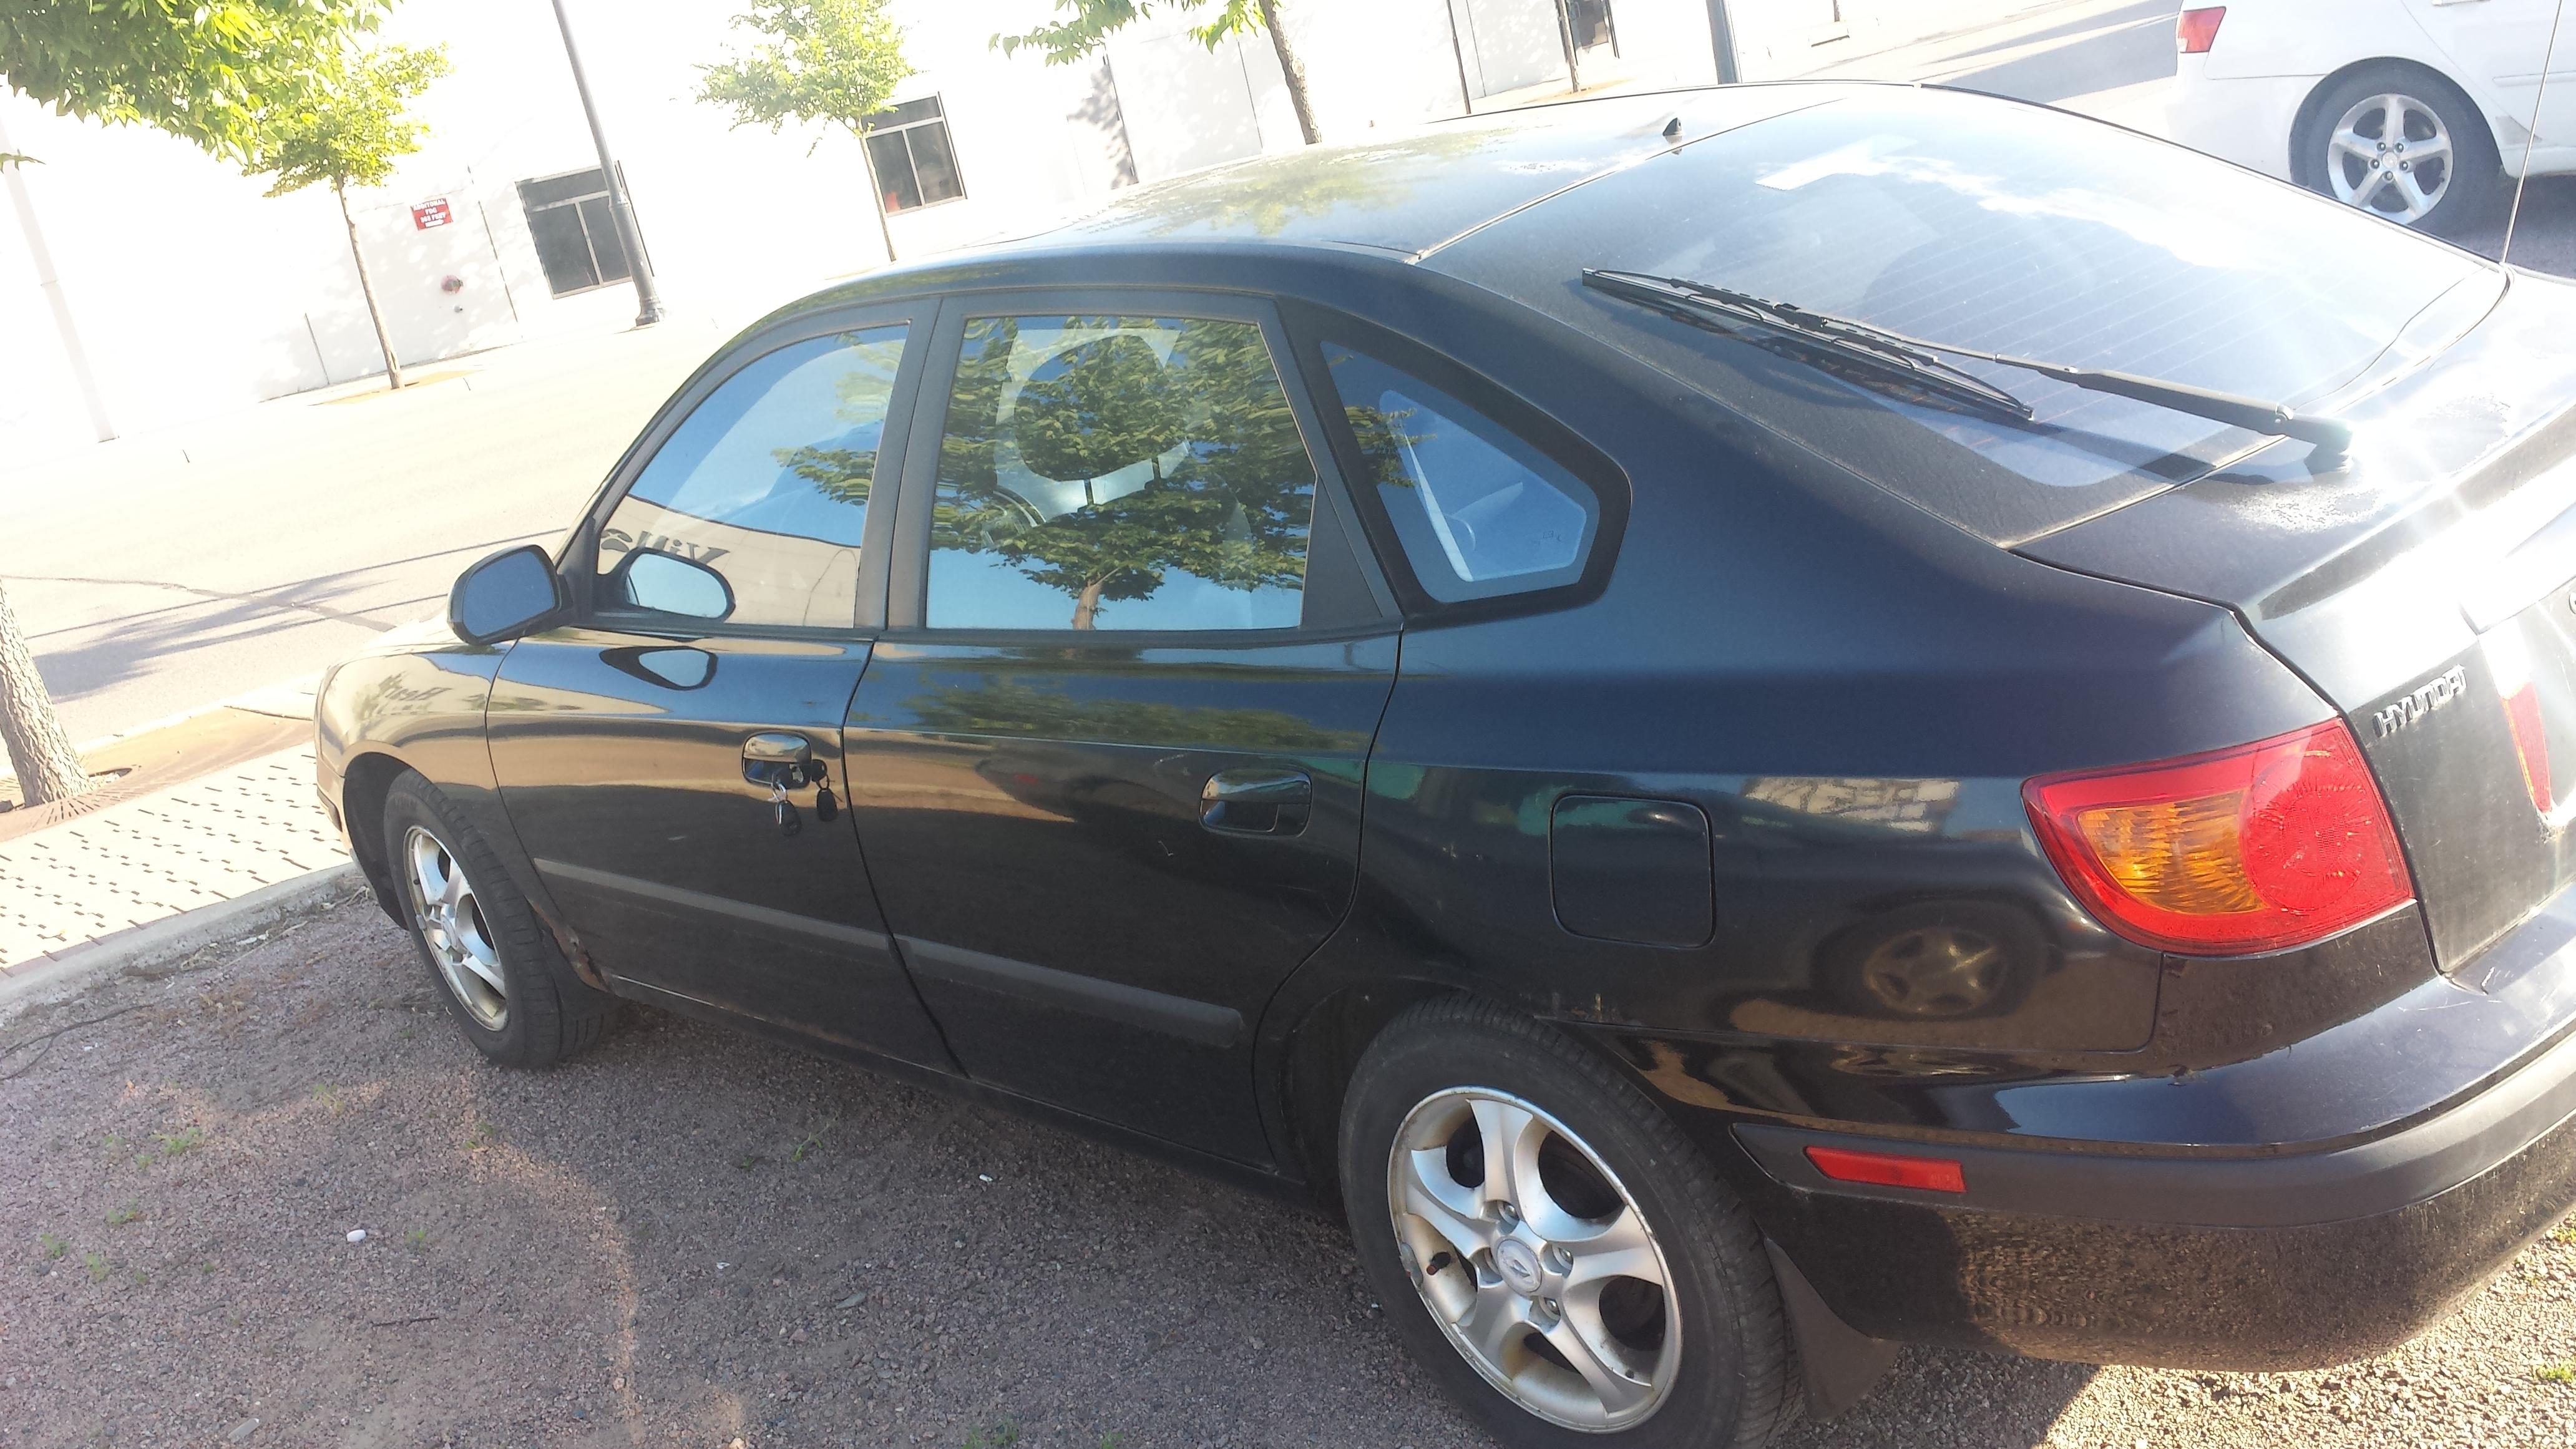 Cash for Cars Vineland, NJ | Sell Your Junk Car | The Clunker Junker